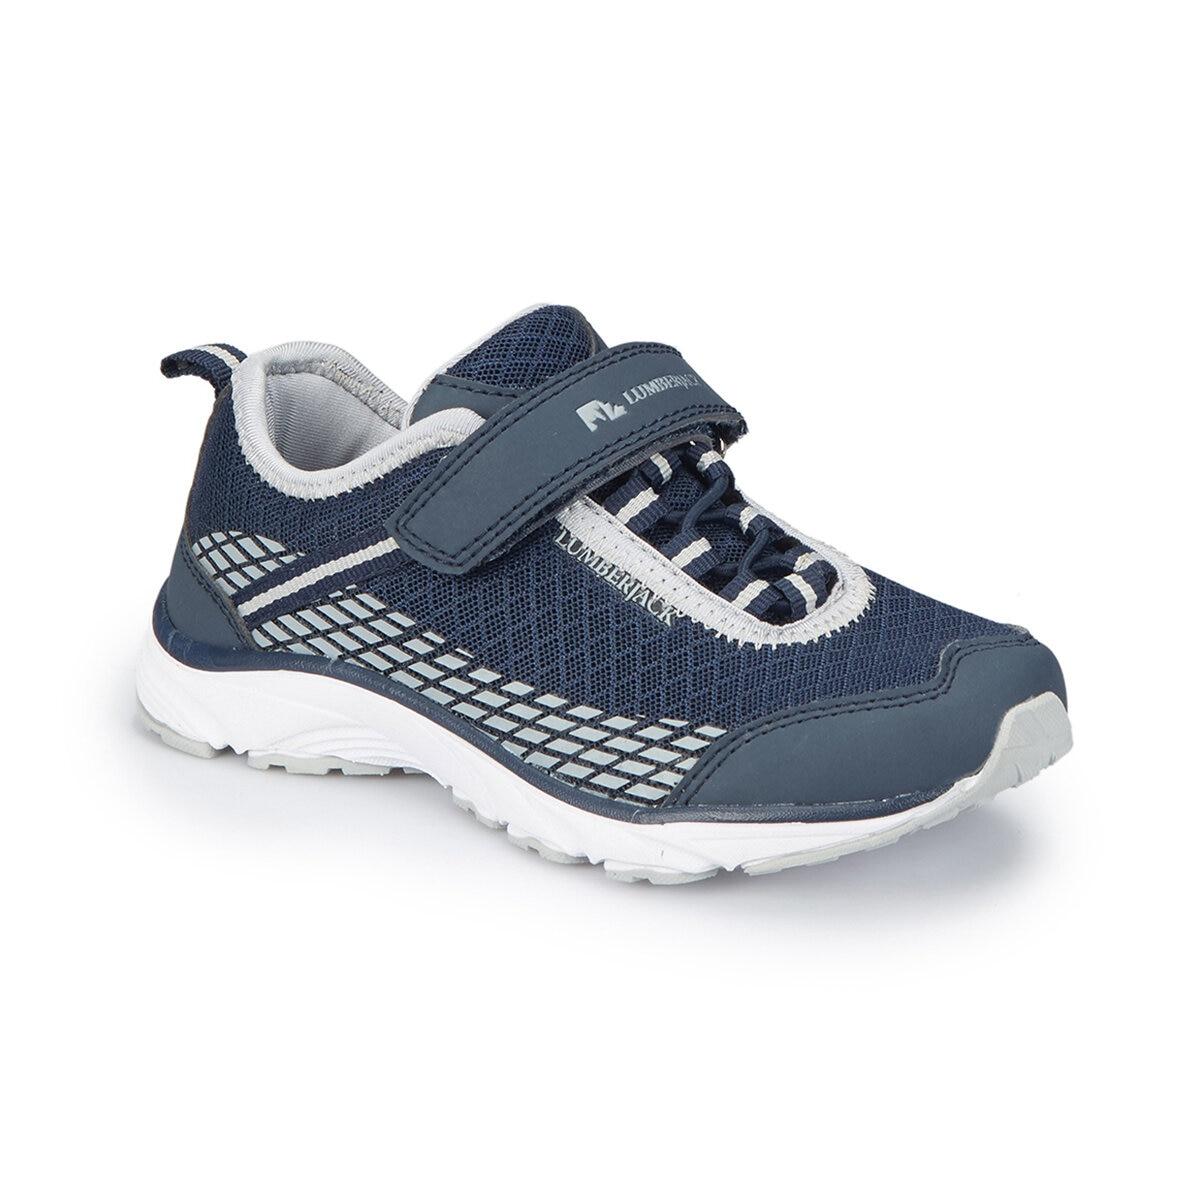 FLO DARE JR Navy Blue Male Child Sports Shoes LUMBERJACK